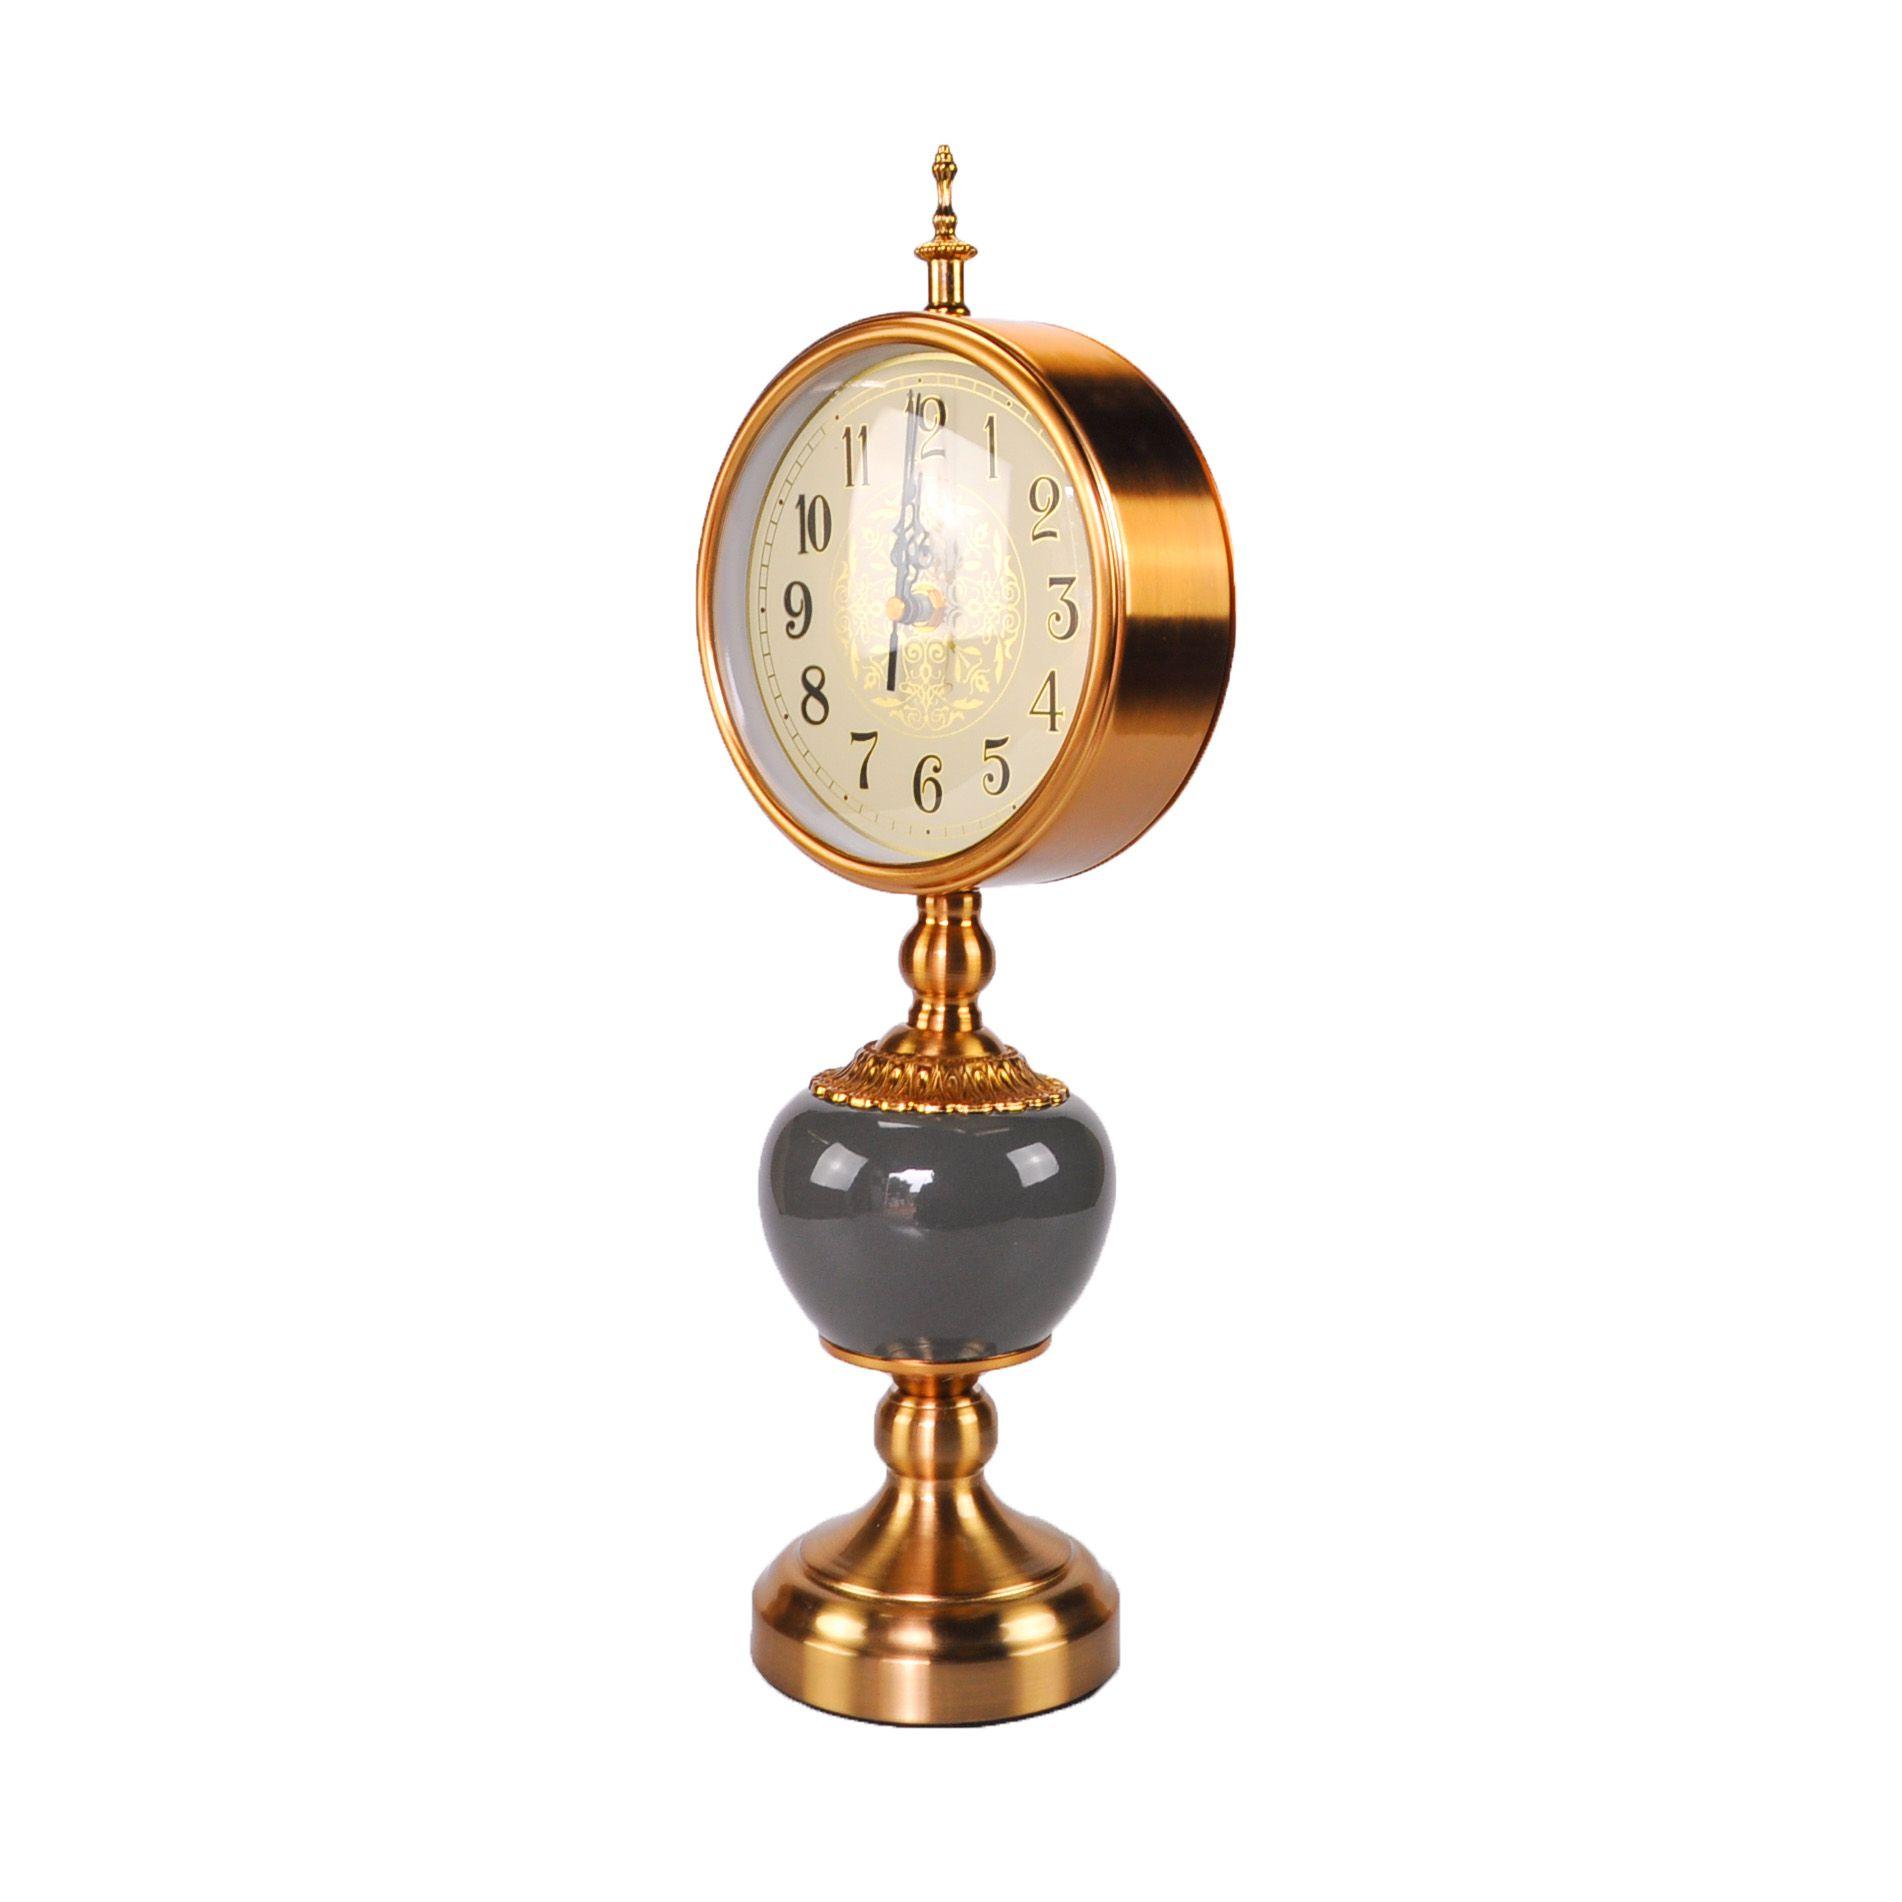 Relógio de Cerâmica 46 x 18 x 10 cm 60852